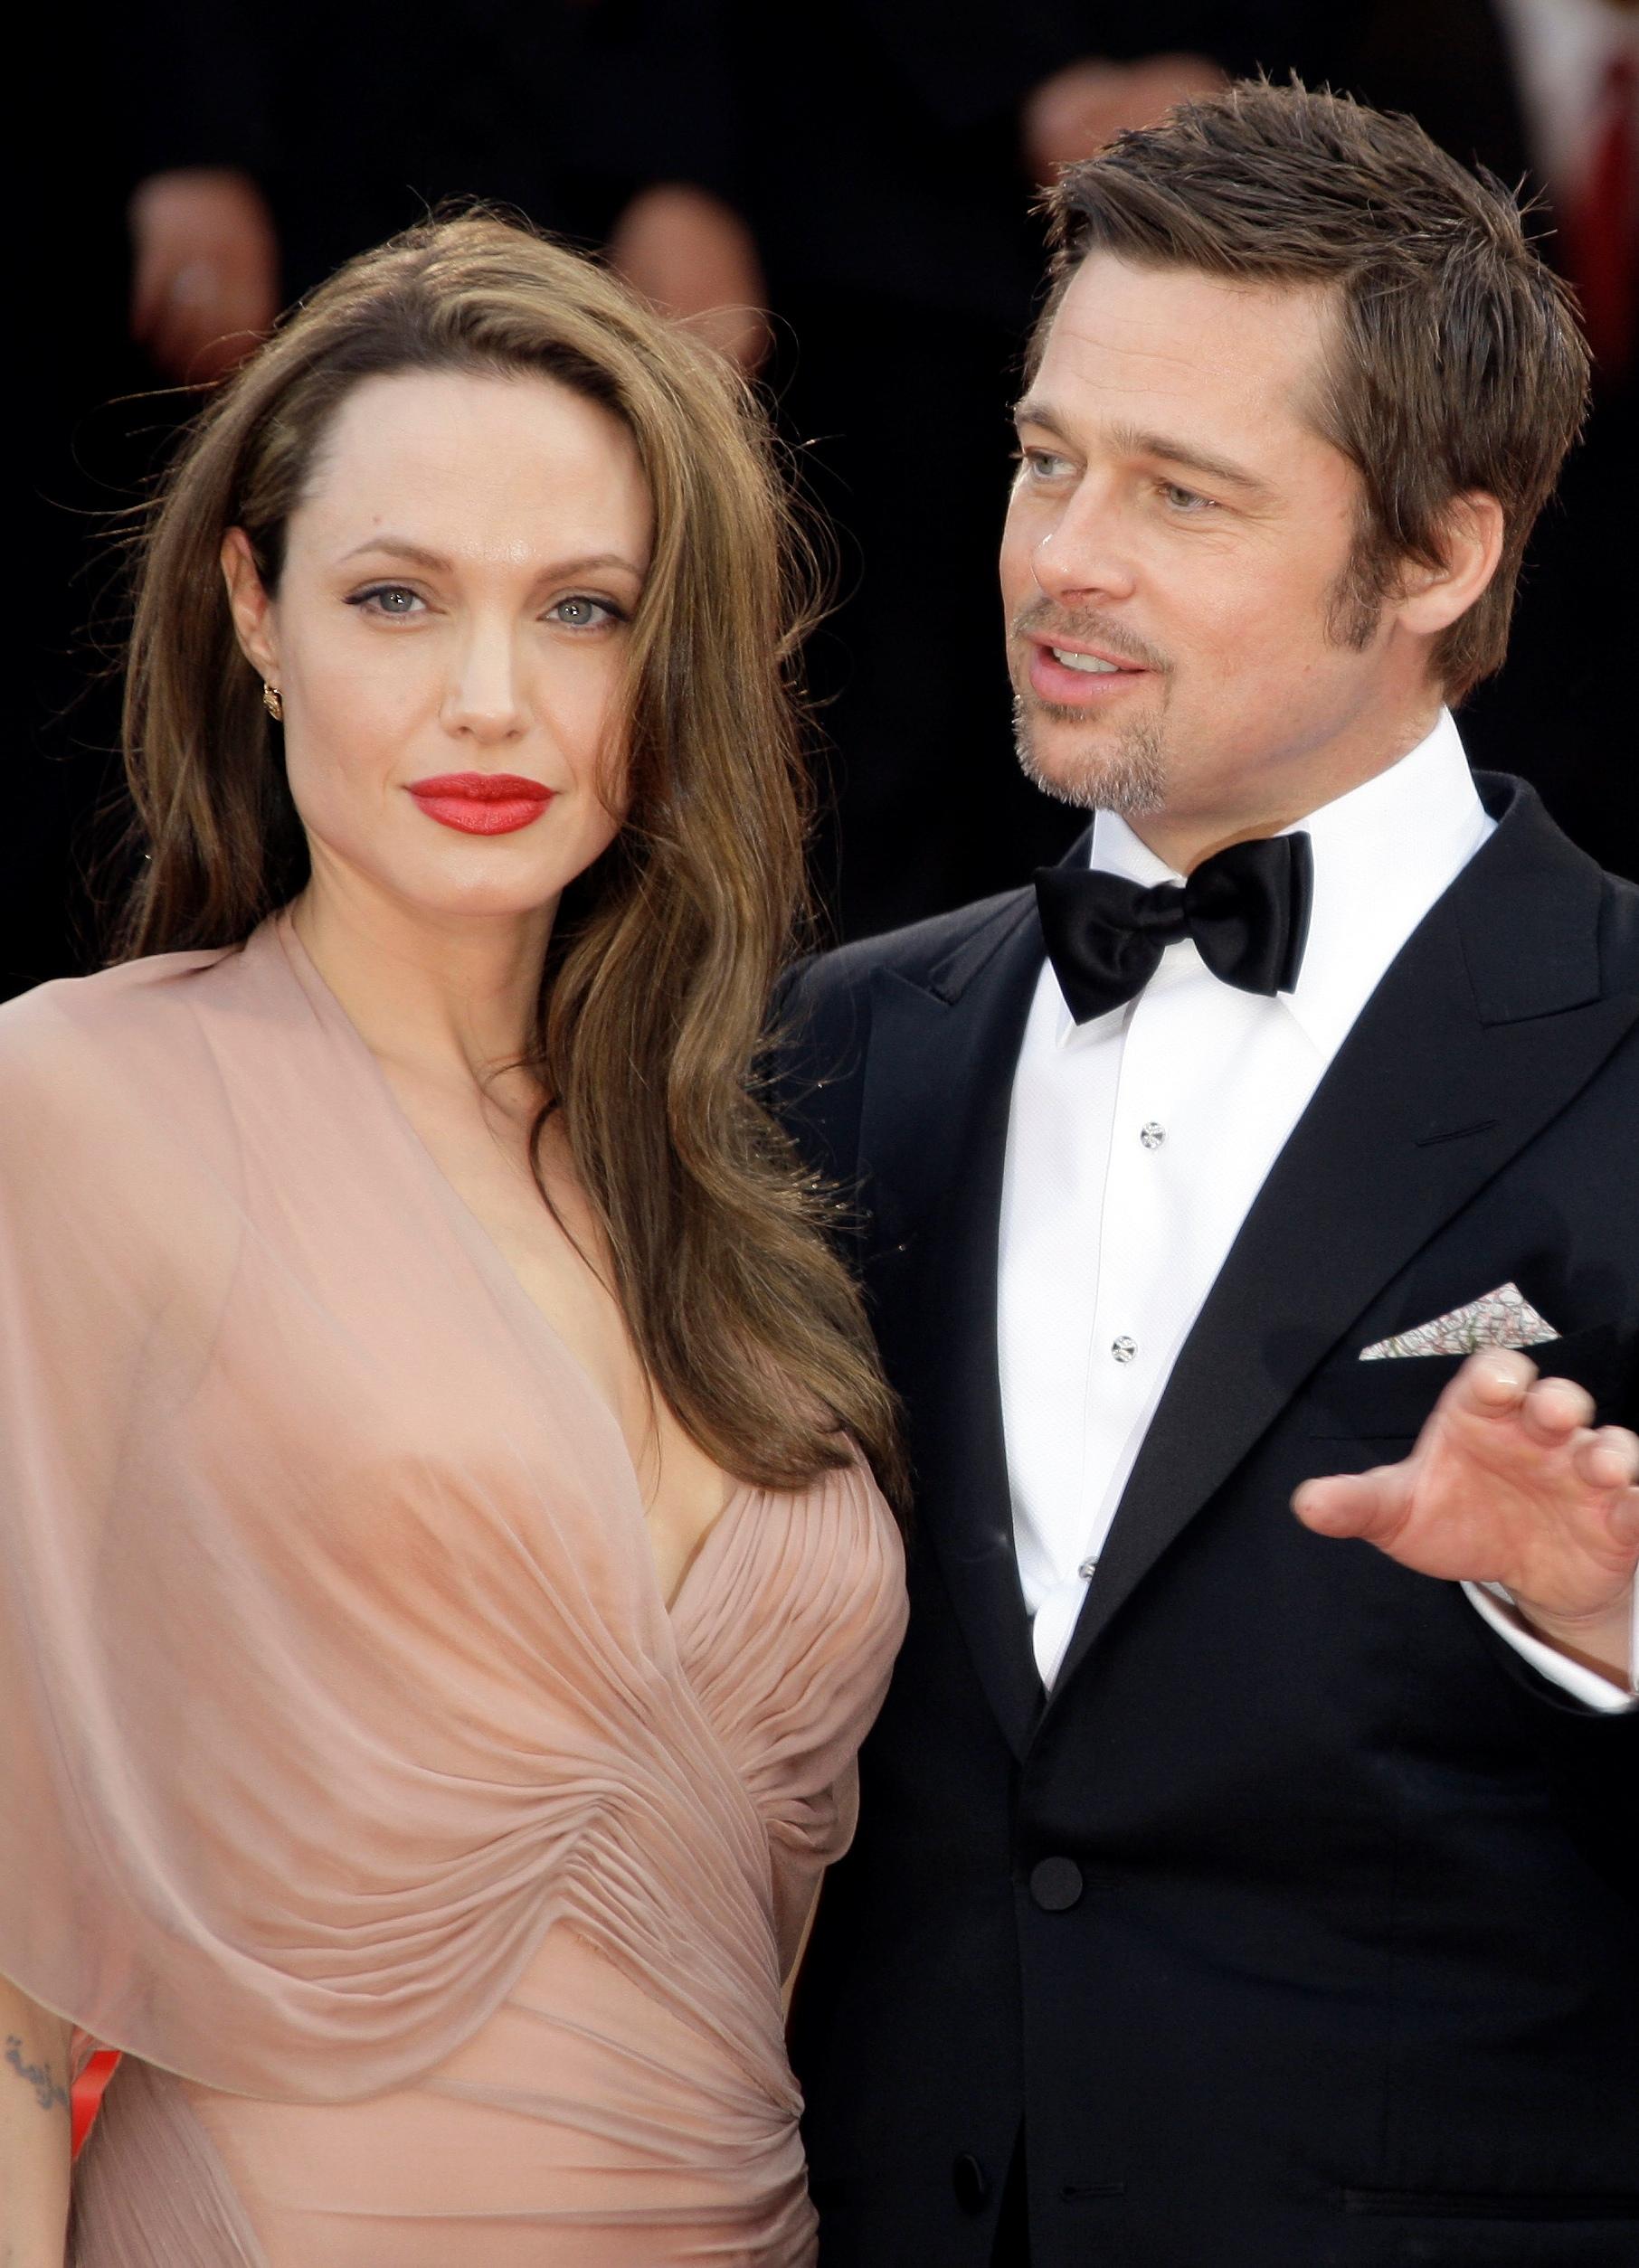 Анджелина Джоли и Бред Питт – последние новости анджелина джоли и брэд питт